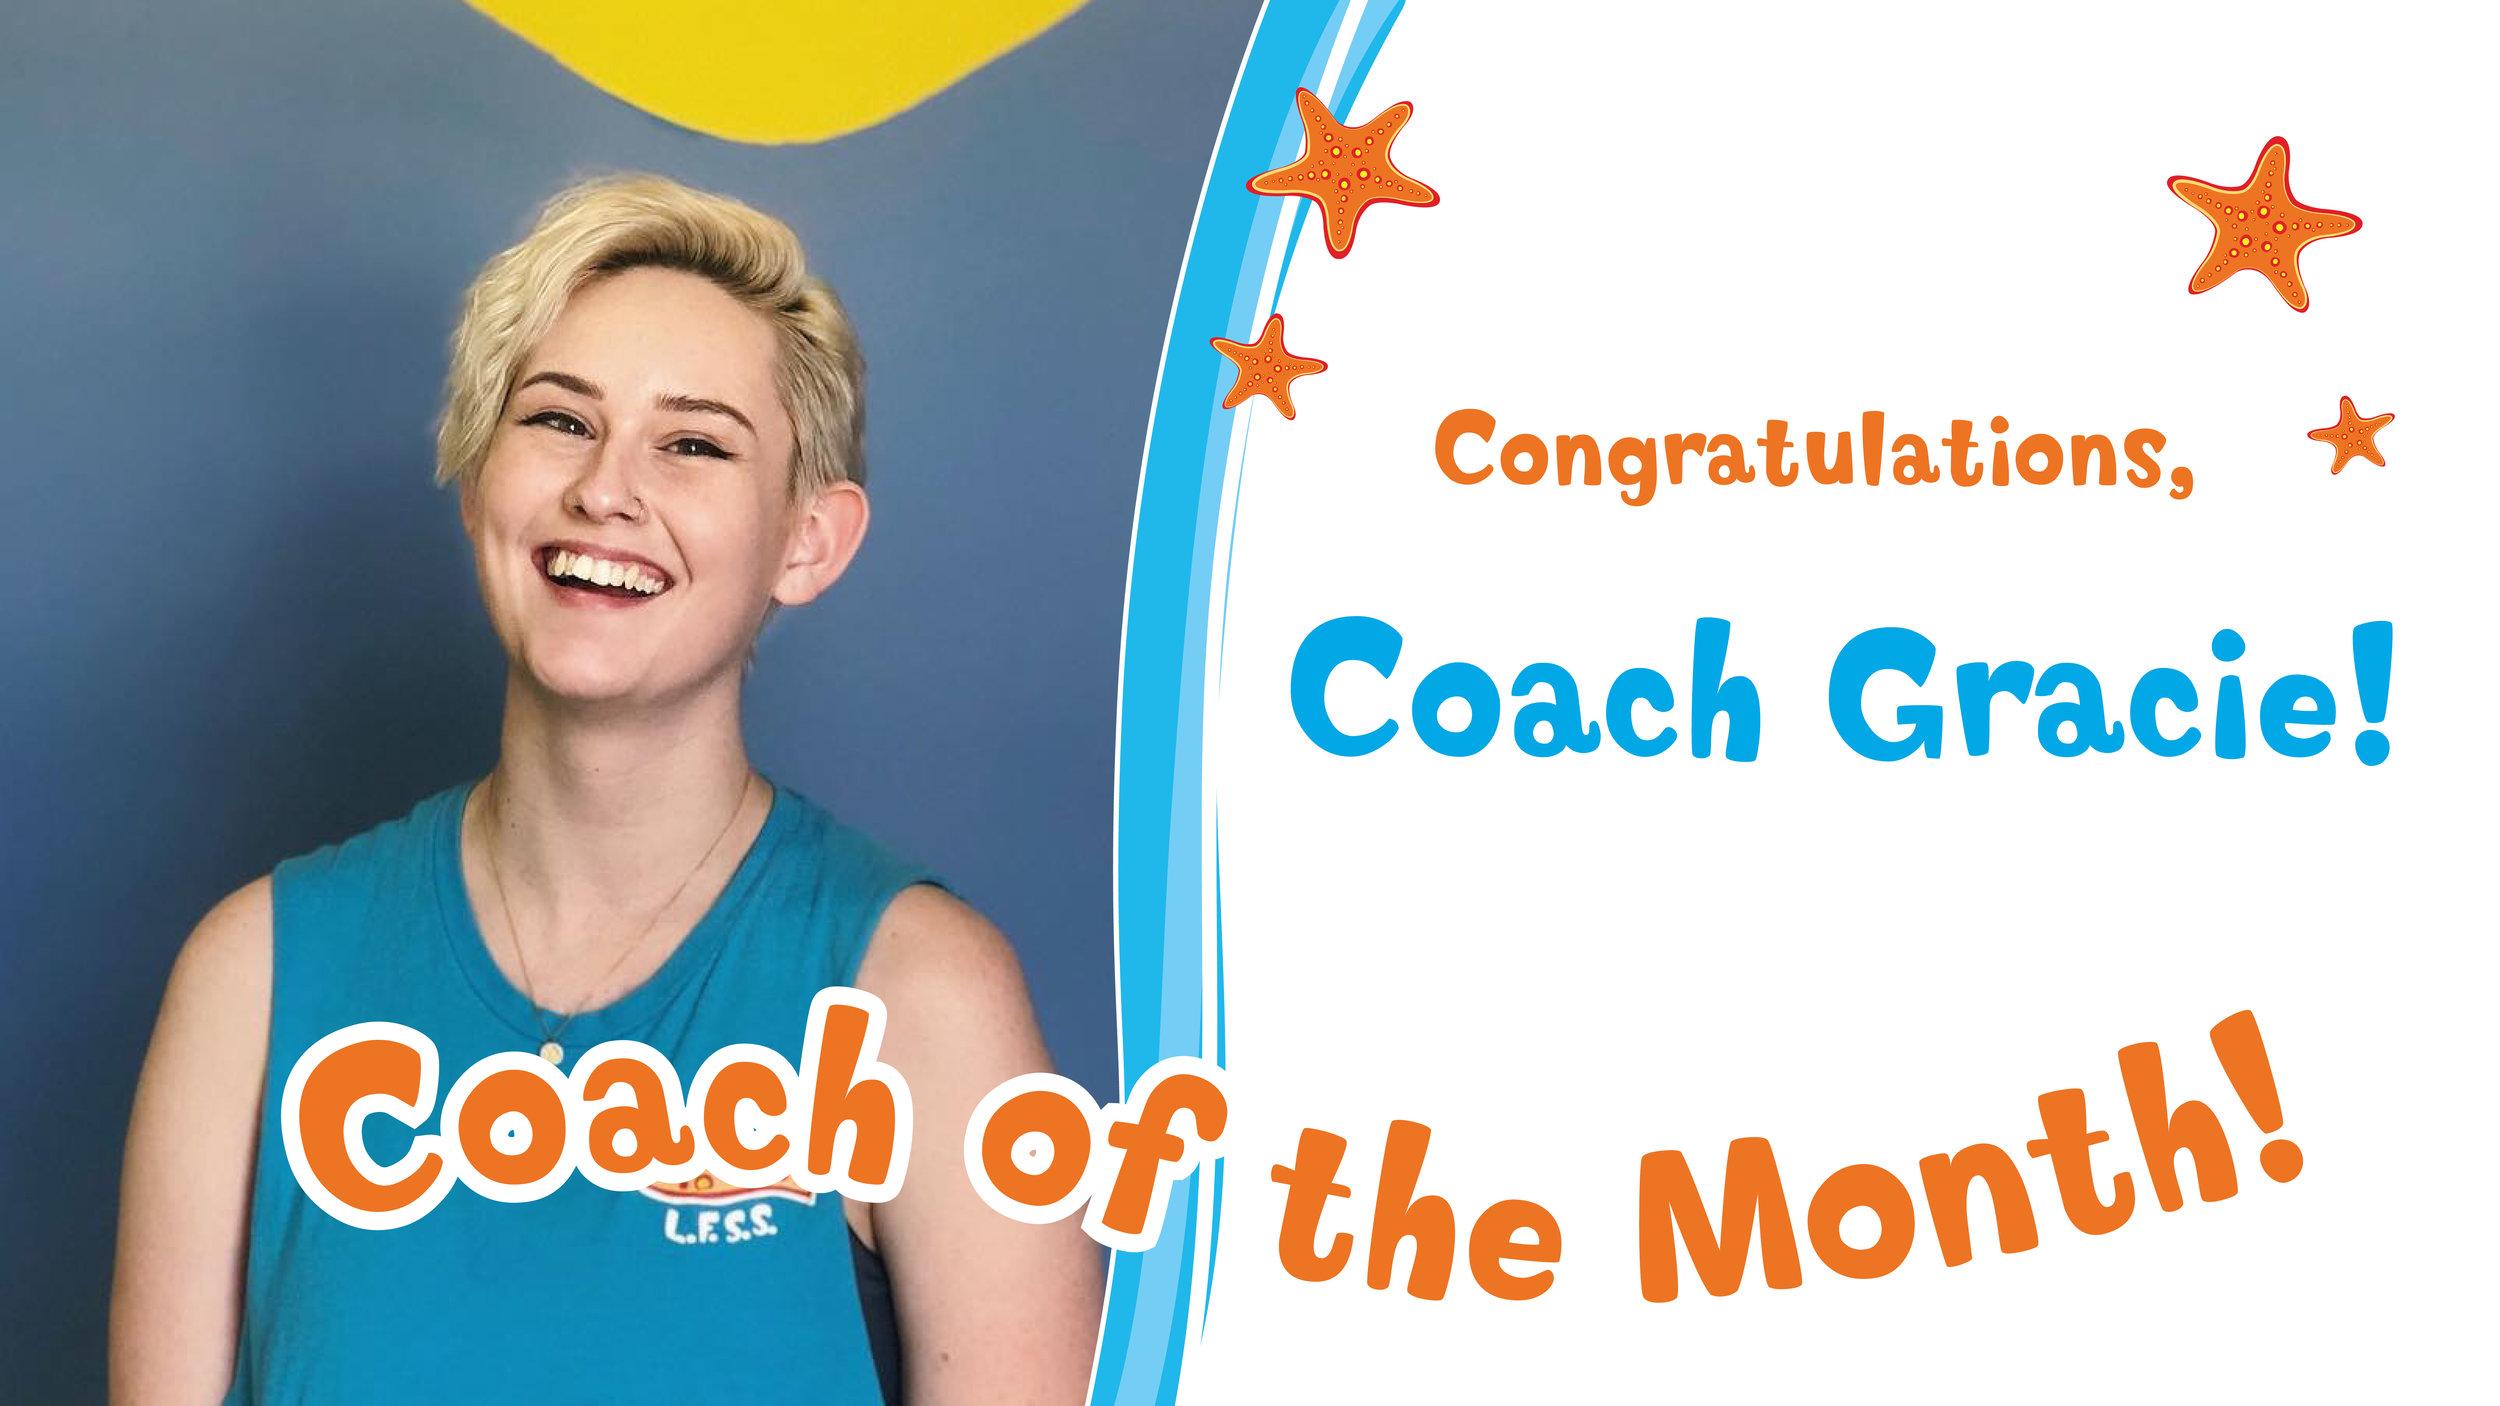 coach gracie.jpg